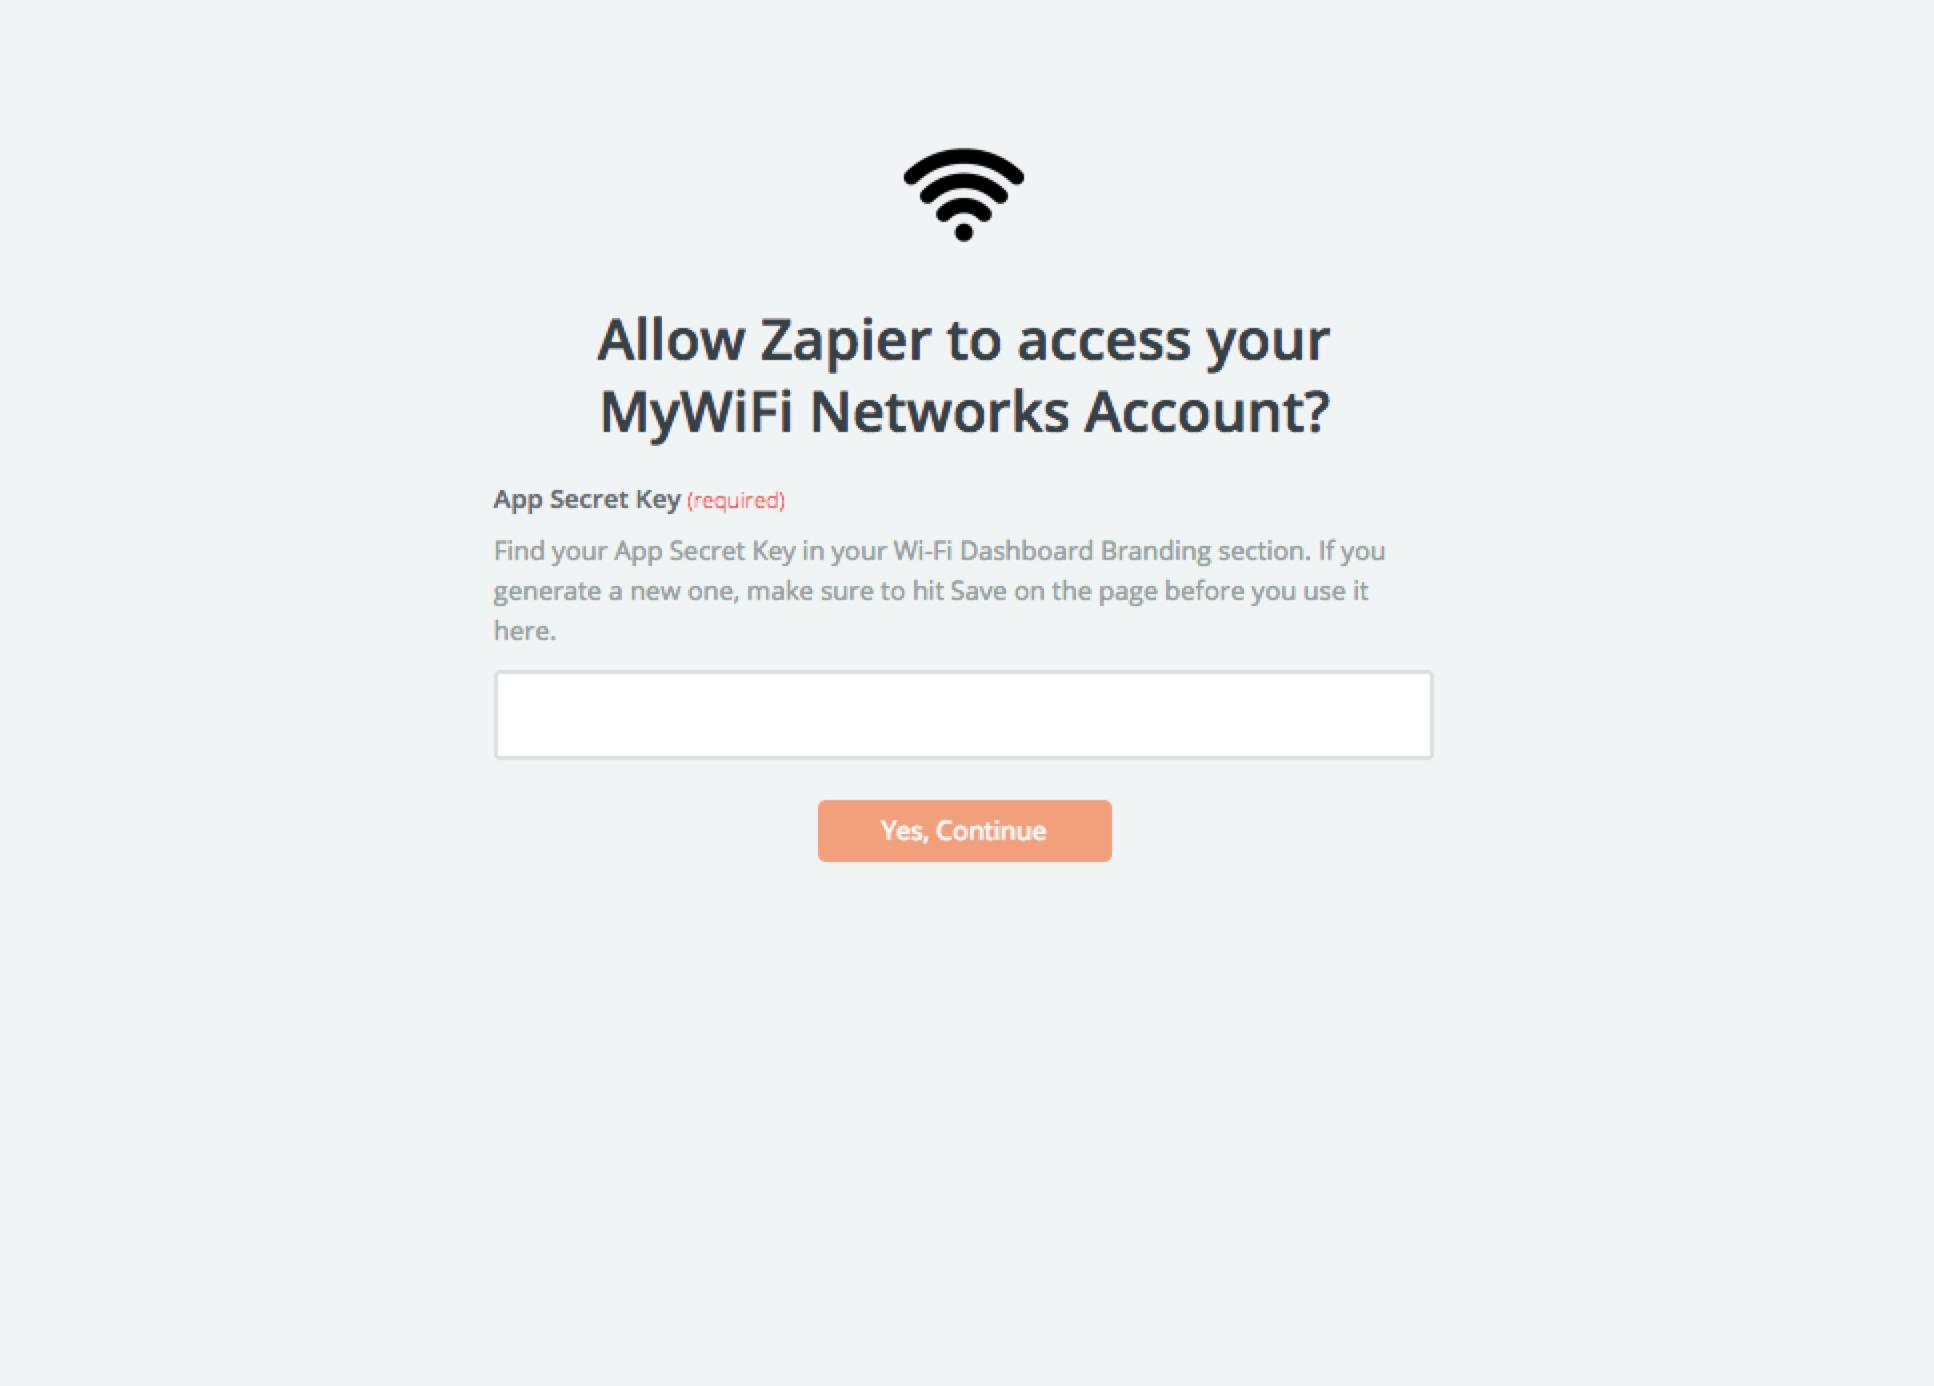 MyWiFi Networks API Key